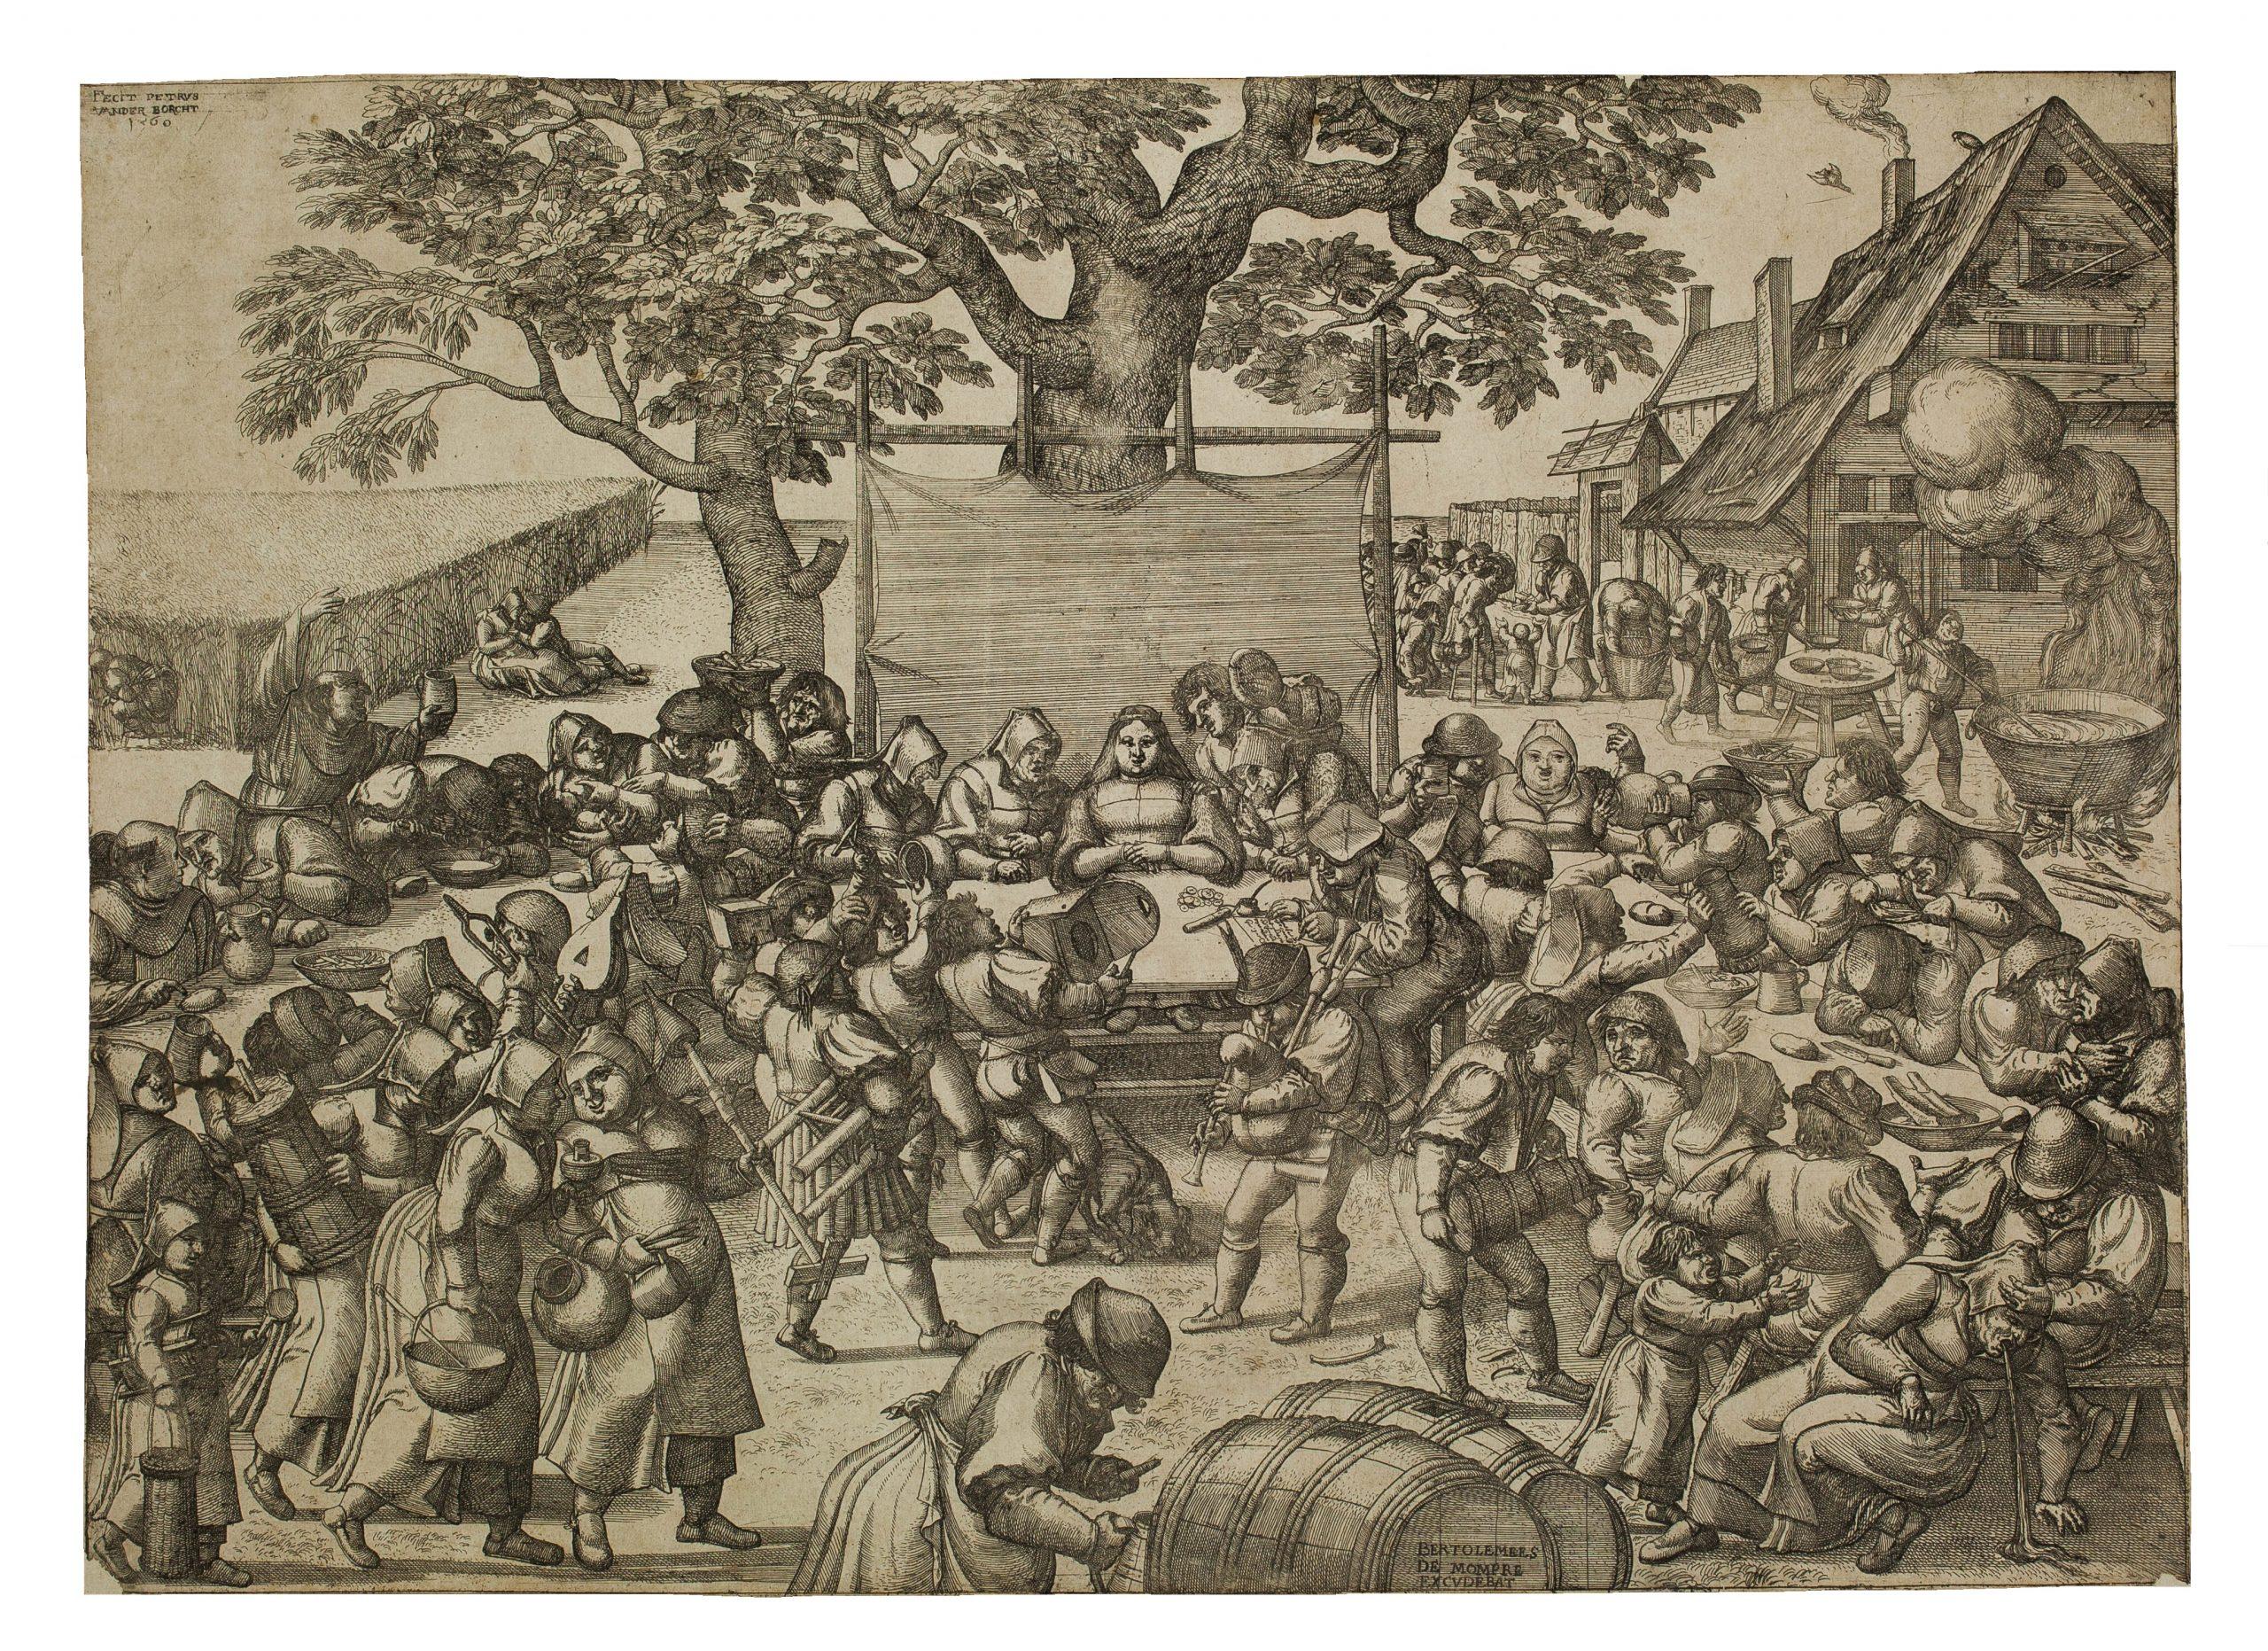 The Large Wedding Feast by Pieter van der Borcht